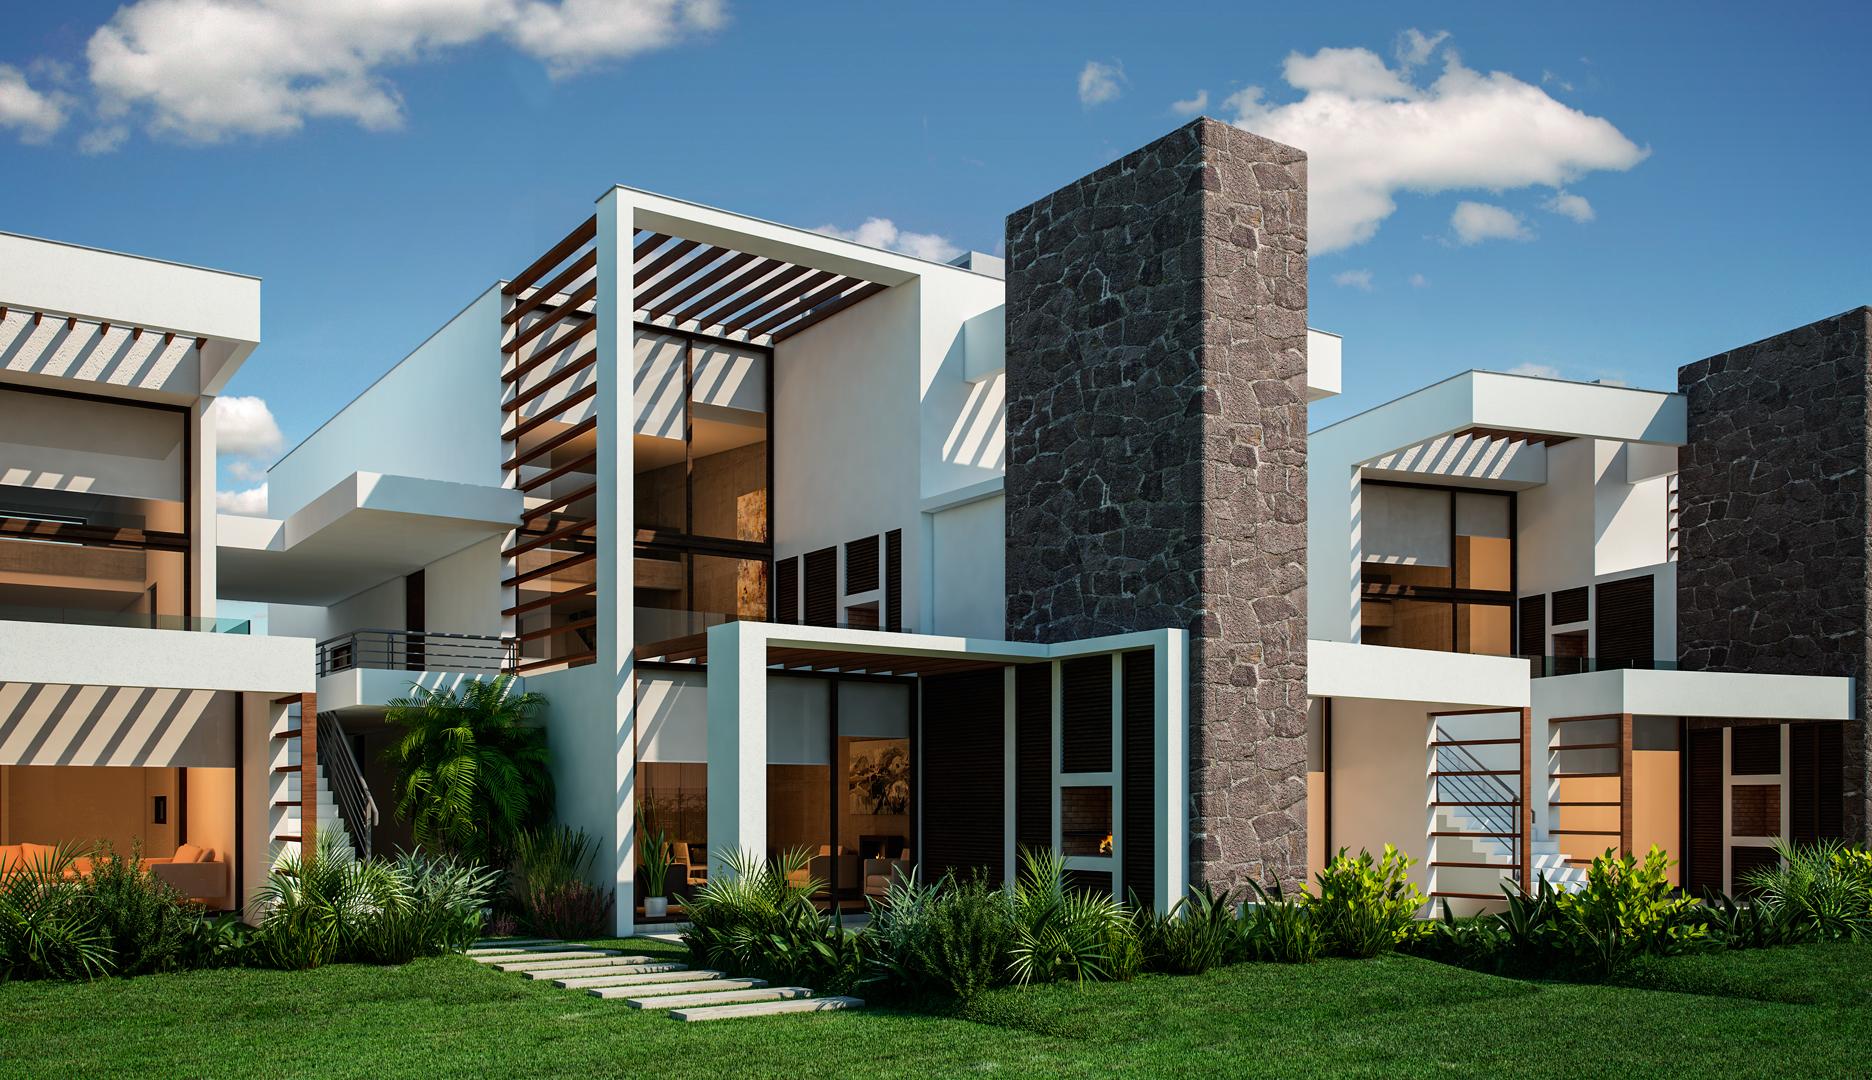 Proyectos en colina for Casas inmobiliaria